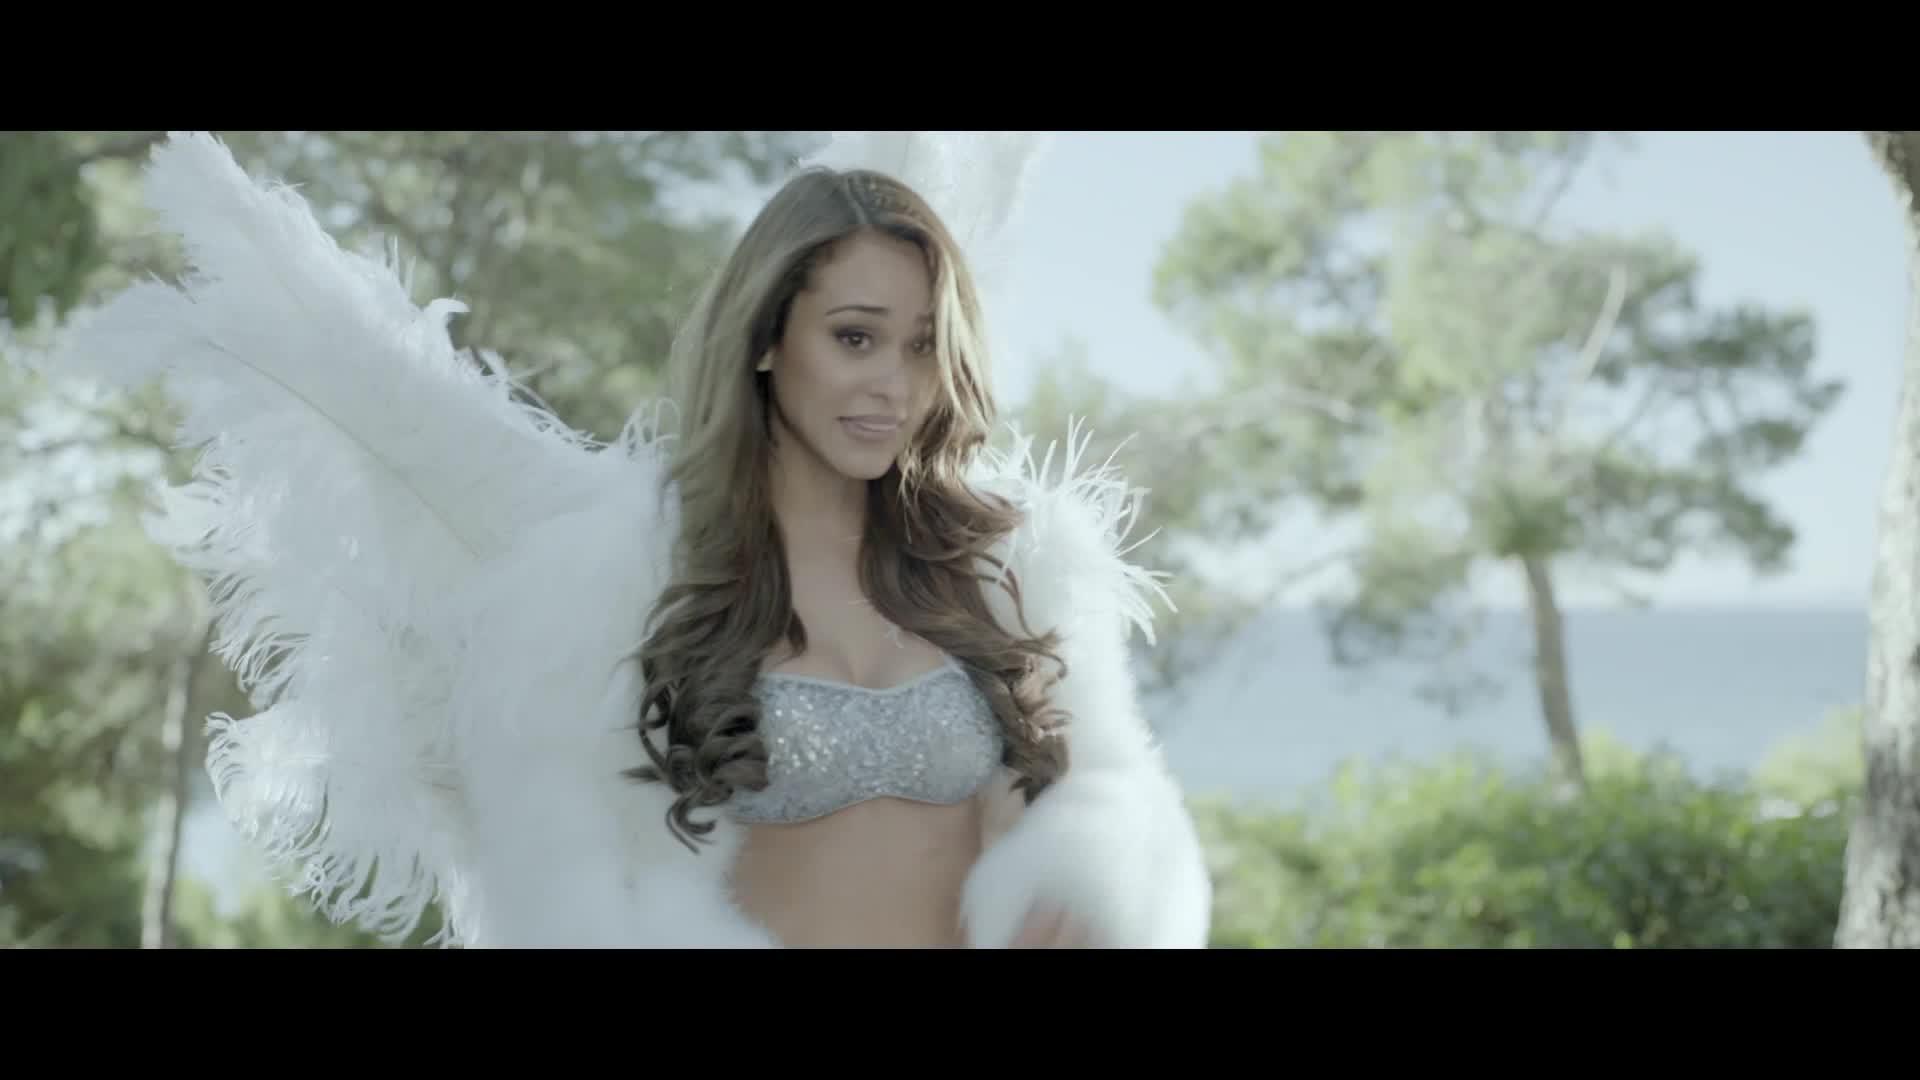 Yanet Garcia dressed as angel scene from Bellezonismo